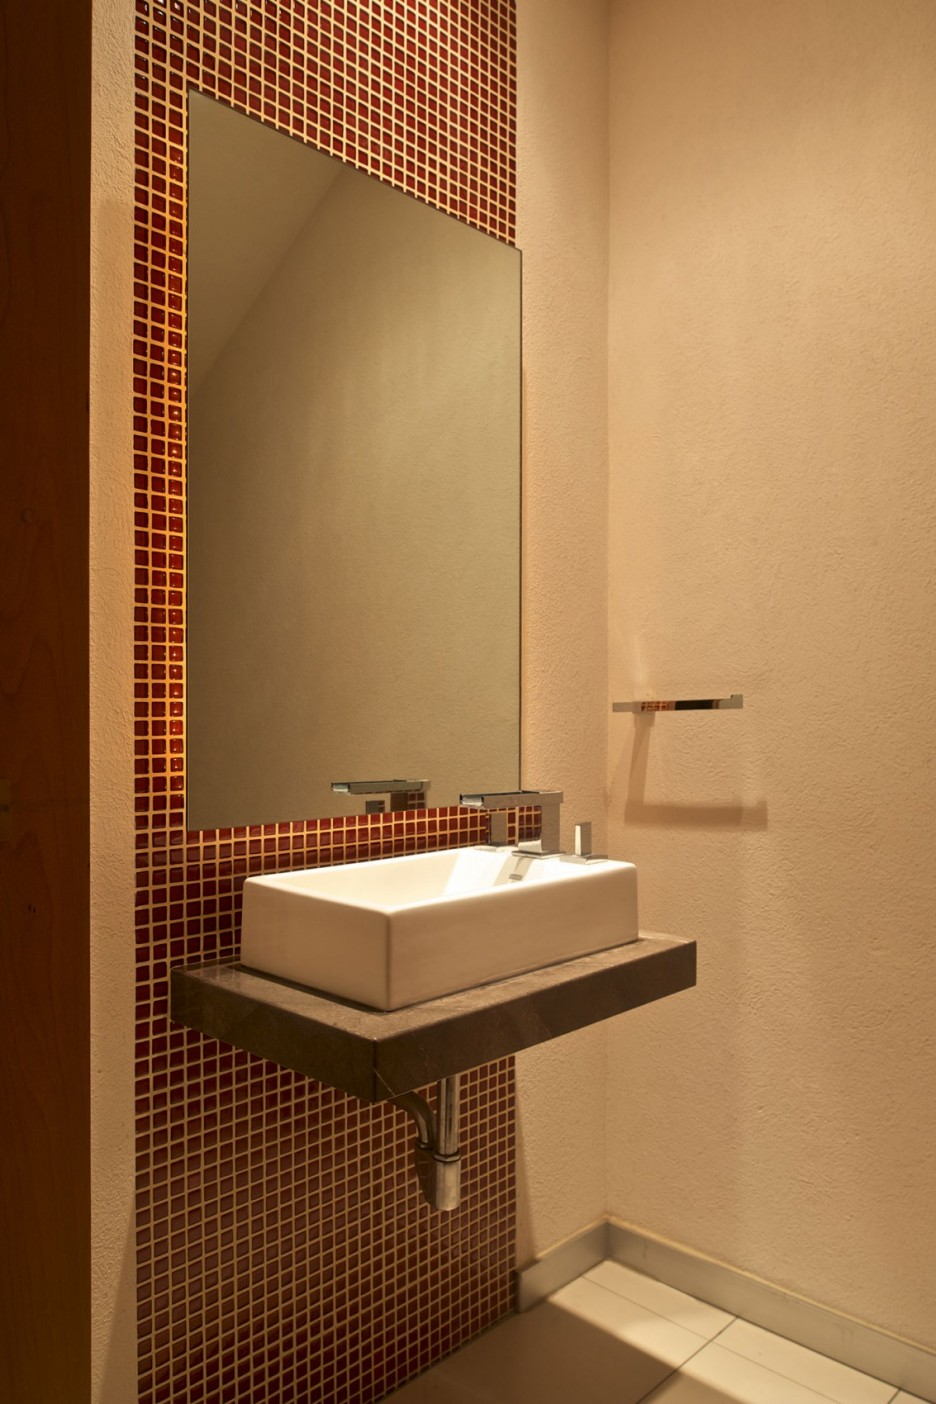 33 Nice Ideas Of Glass Tile Backsplash Bathroom Pictures 2019